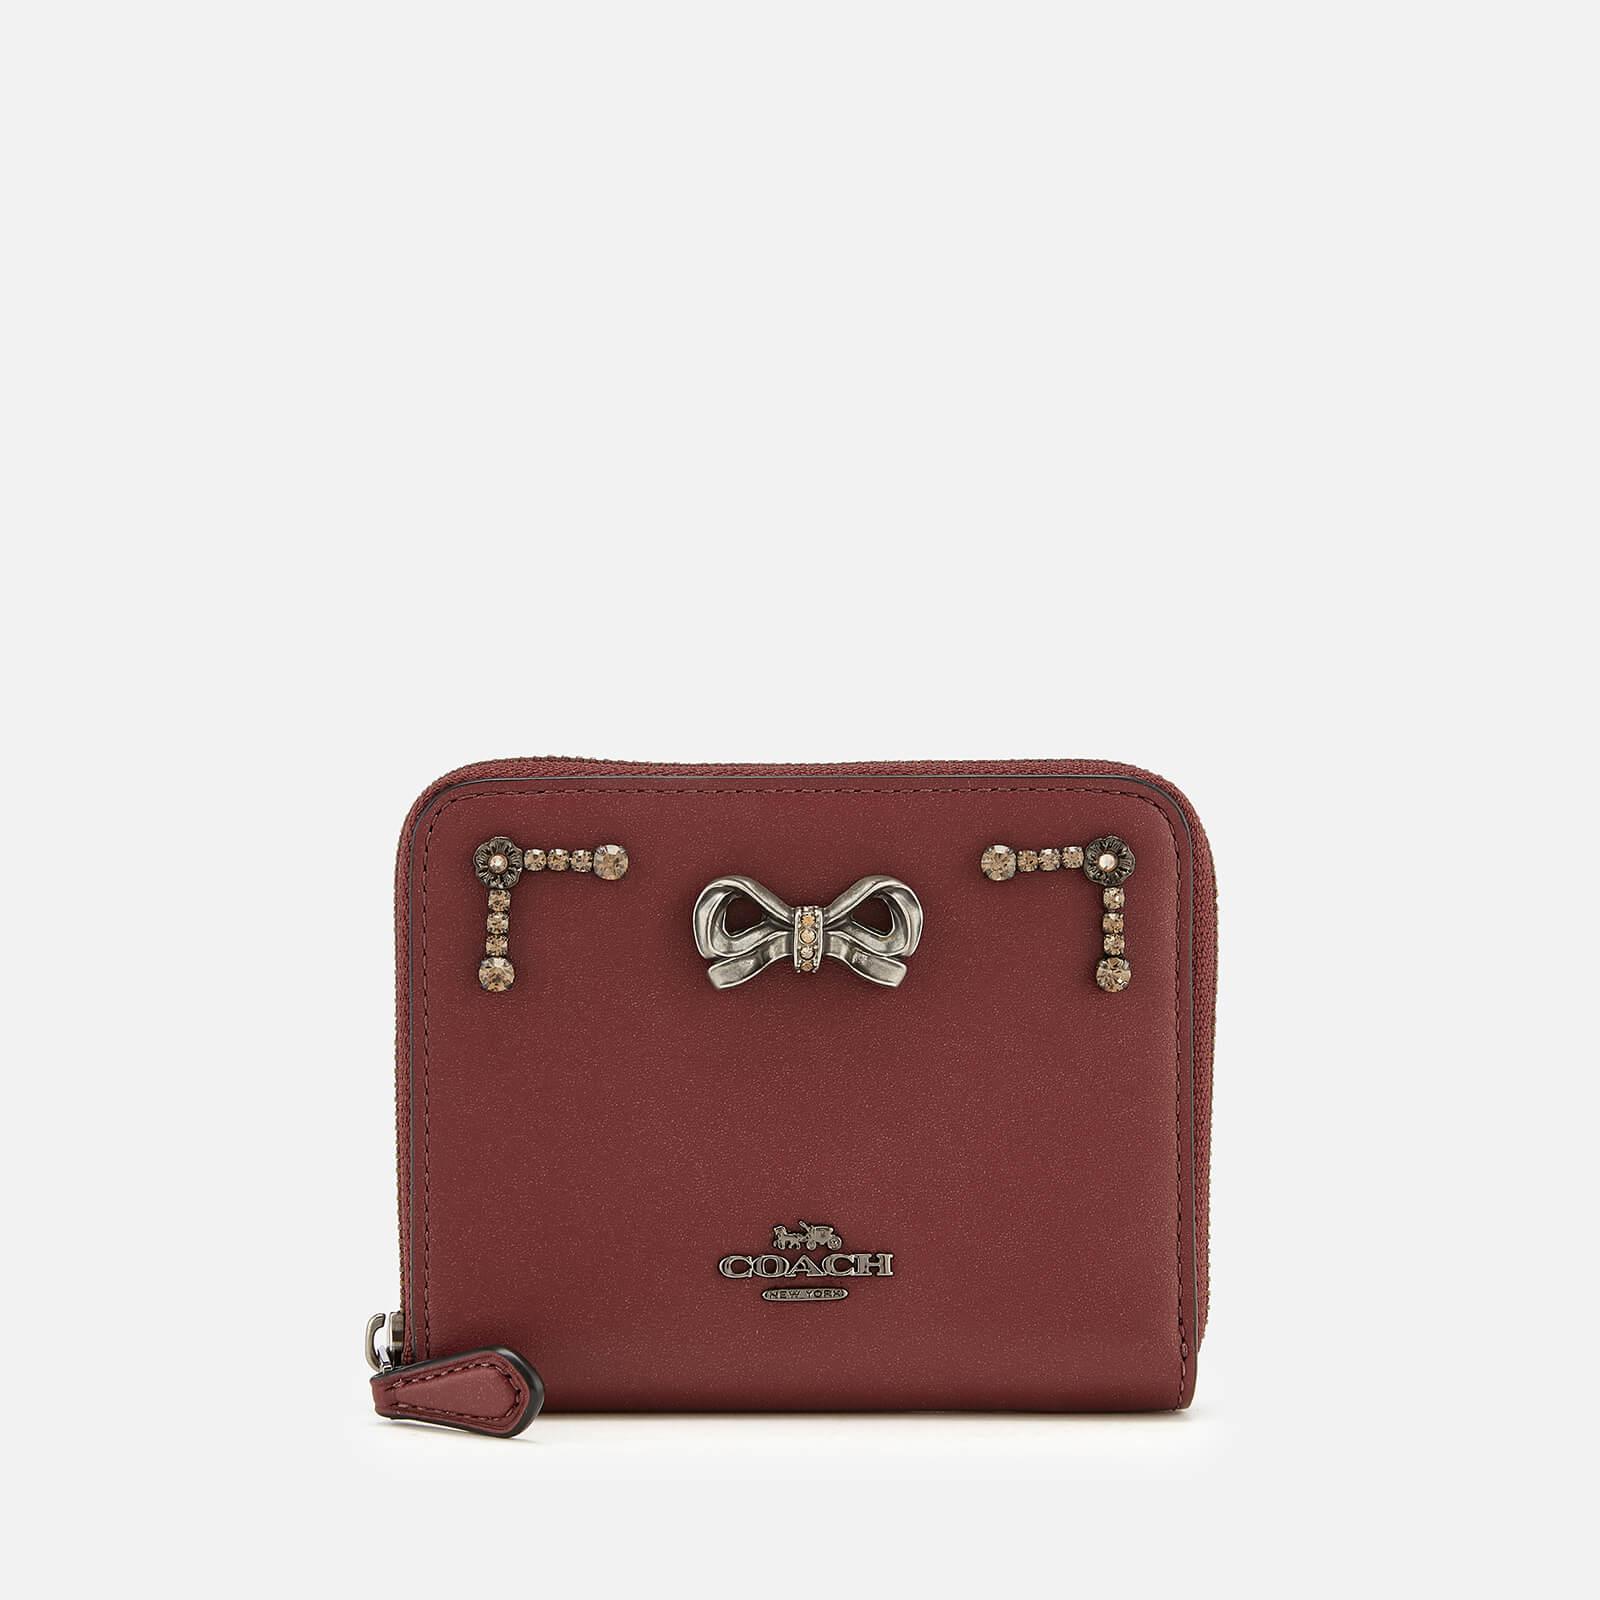 9843b75e8b95 Coach Women s Selena Crystal Embellishment Zip Around Purse - Wine - Free  UK Delivery over £50